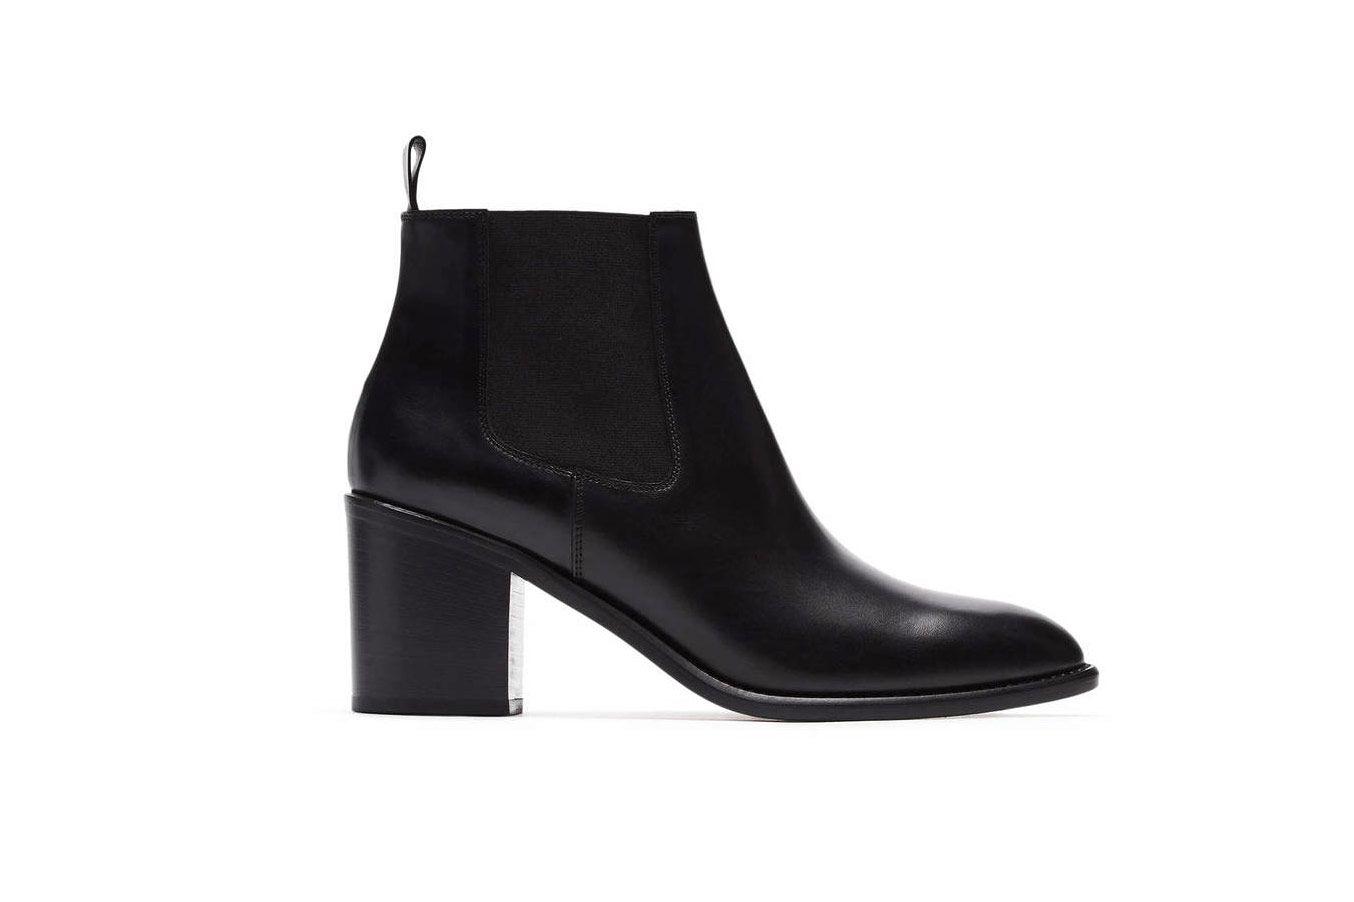 Jenni Kayne Heeled Chelsea Boot